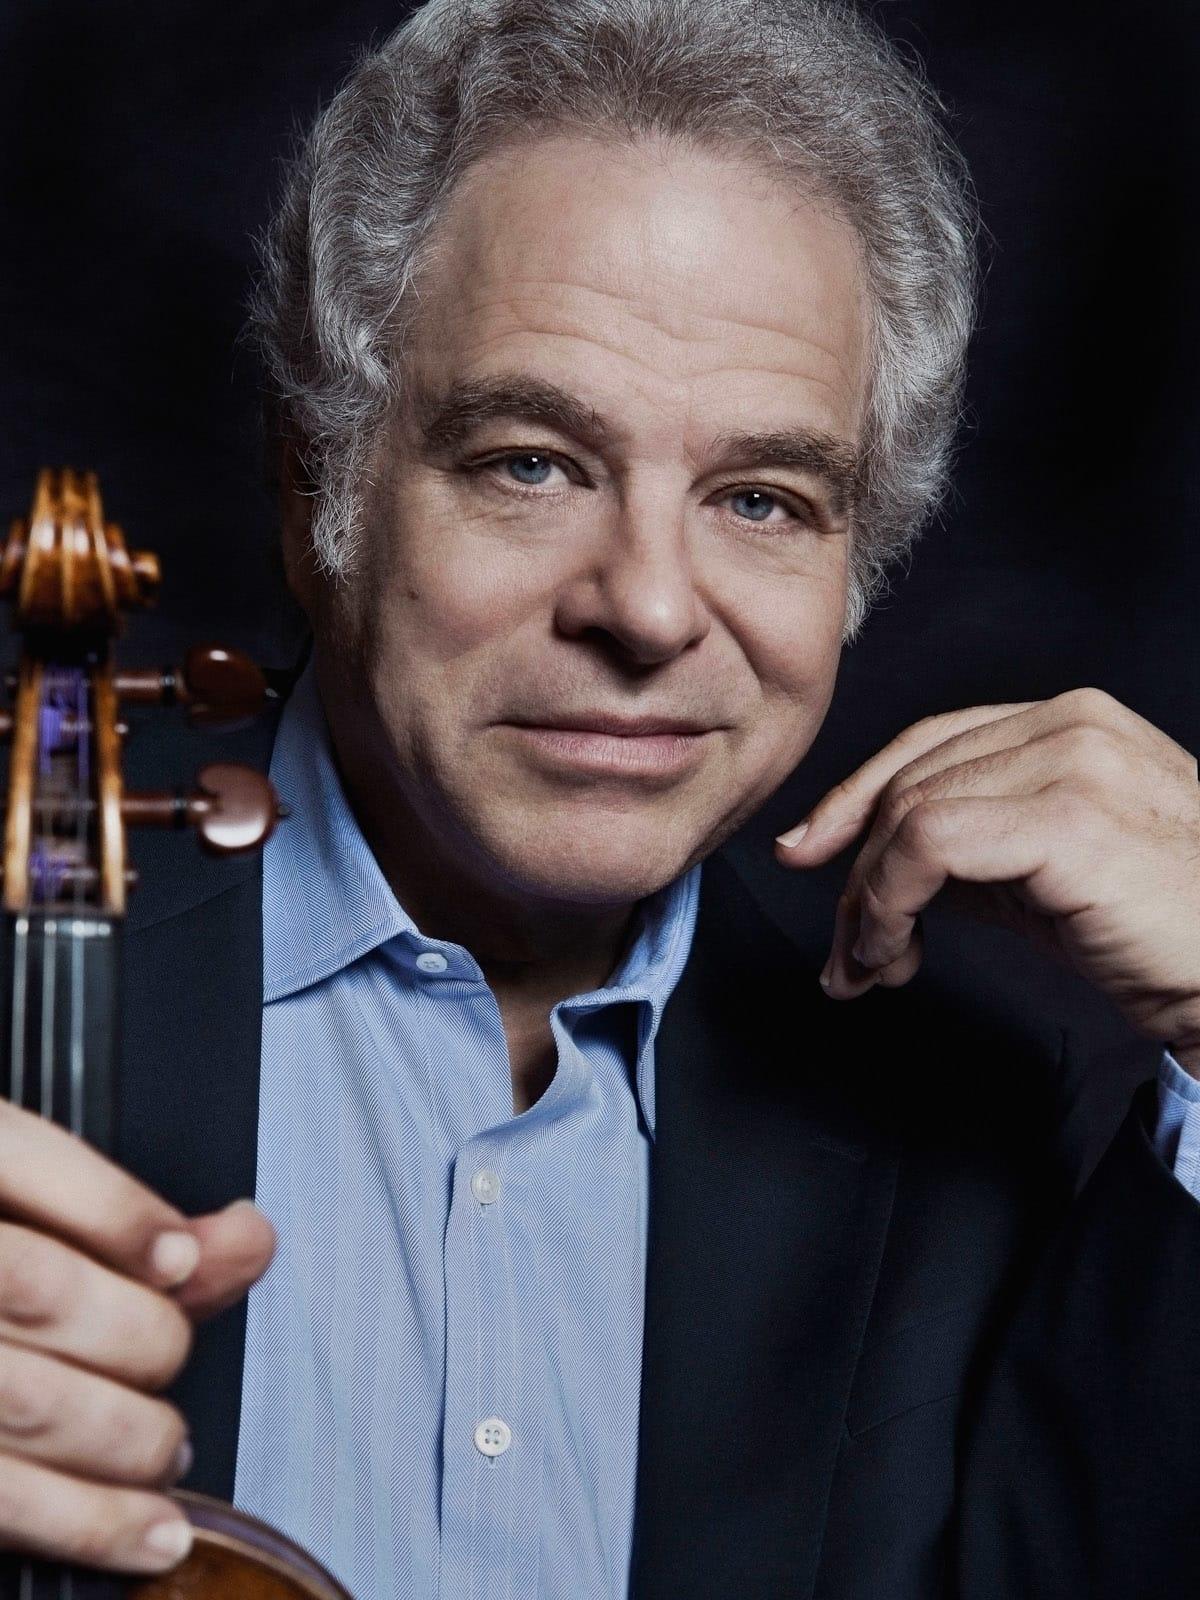 Itzhak Perlman, violinist, January 2013